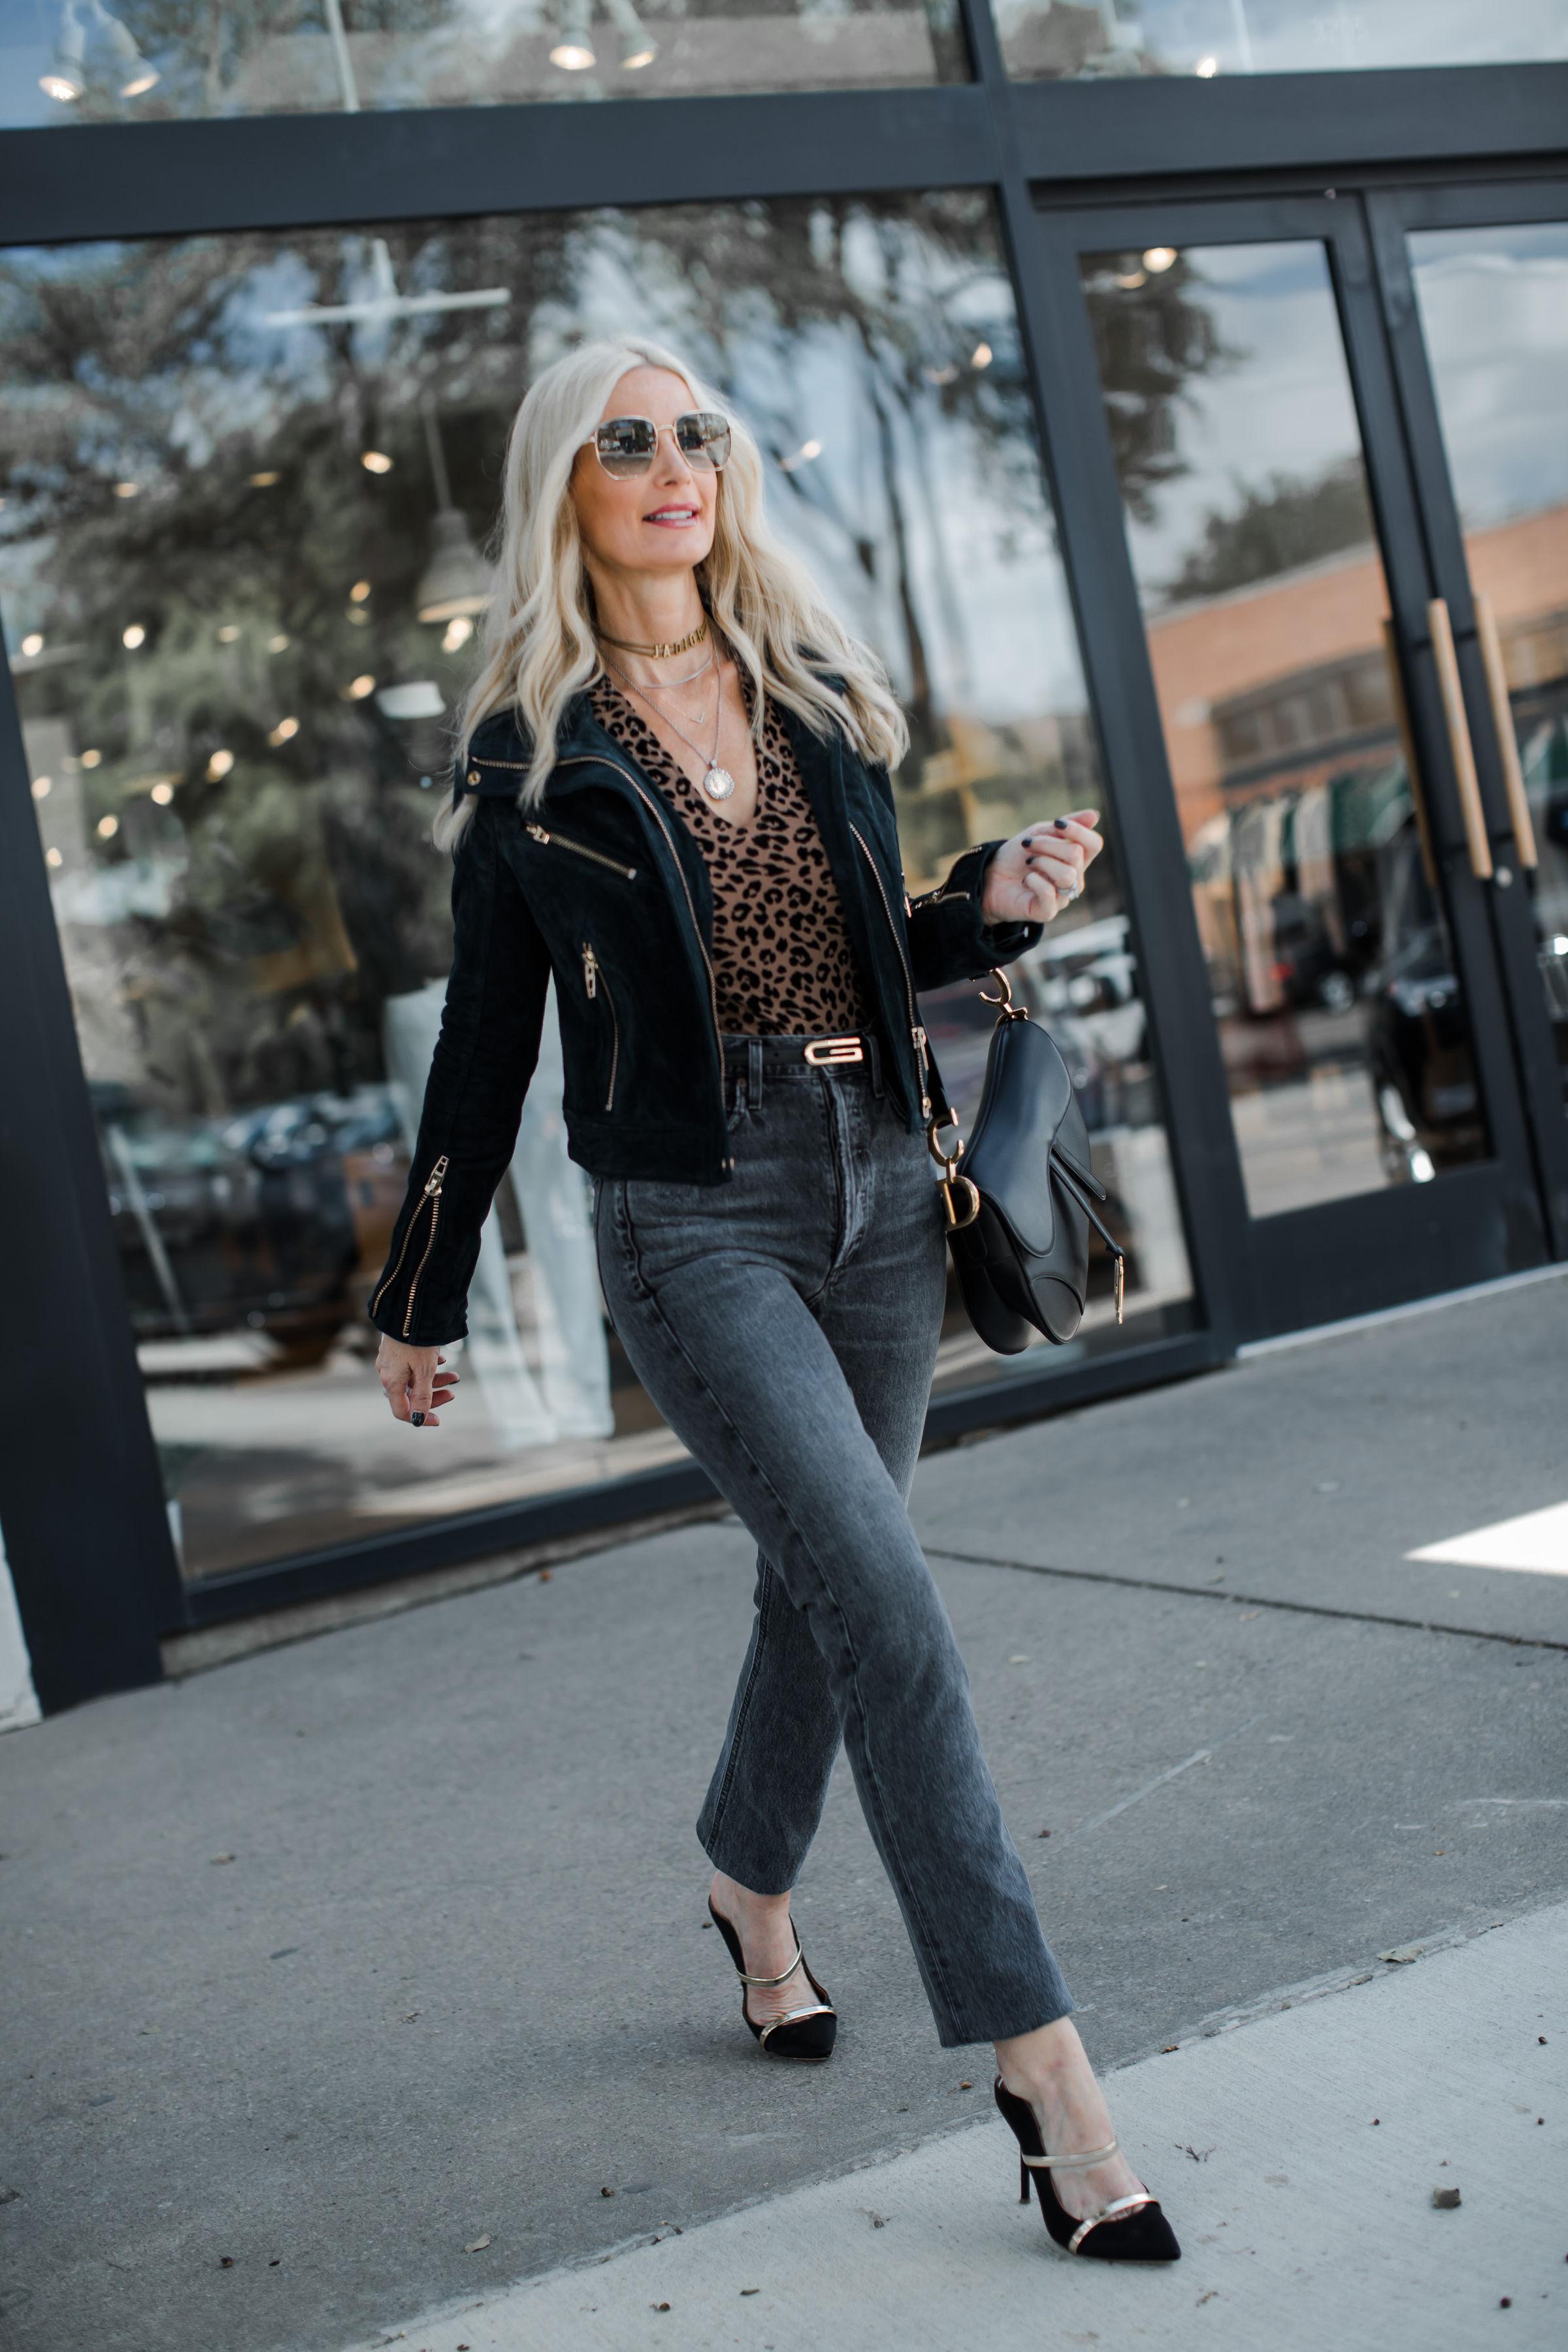 Dallas Fashion Blogger Wearing A Moto Jacket